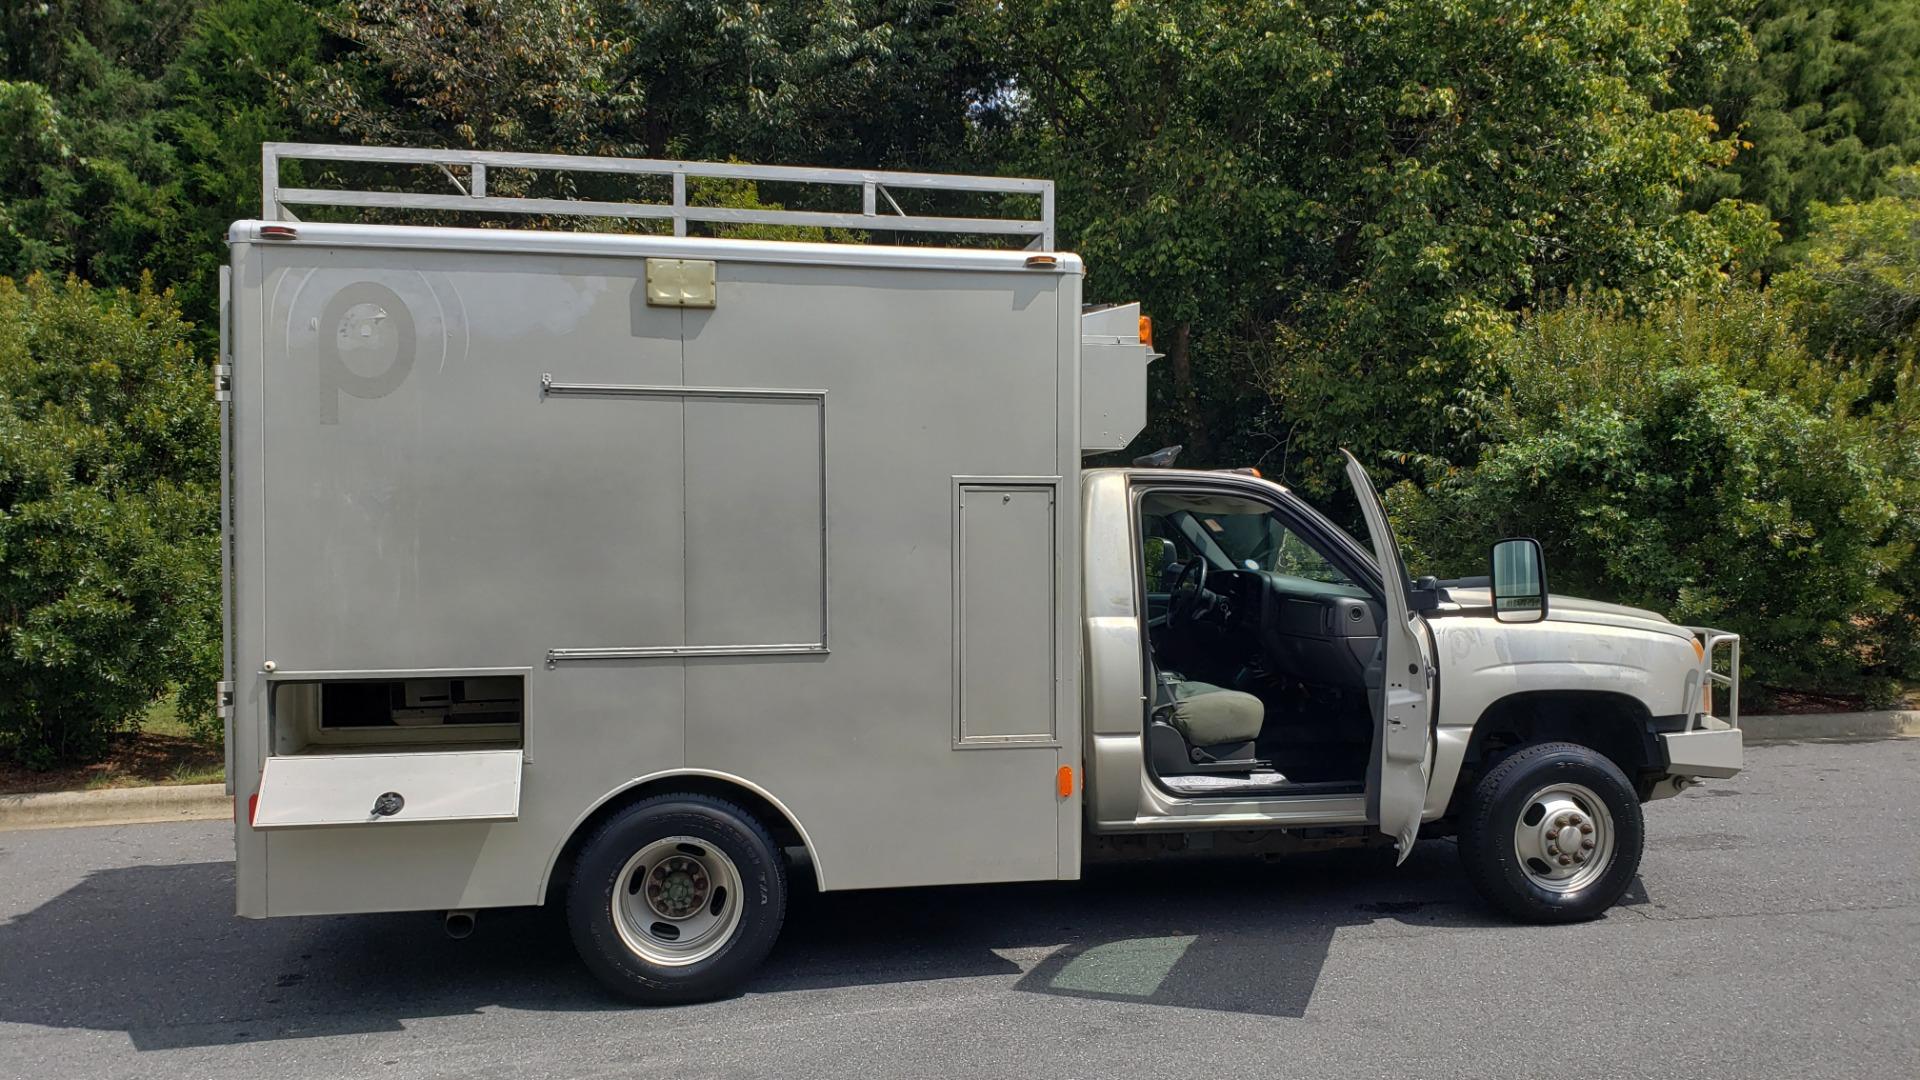 Used 2005 Chevrolet SILVERADO 3500 DRW / 4WD / REG CAB / 6.6L DURAMAX / DOOMSDAY PREPPER for sale $21,595 at Formula Imports in Charlotte NC 28227 14